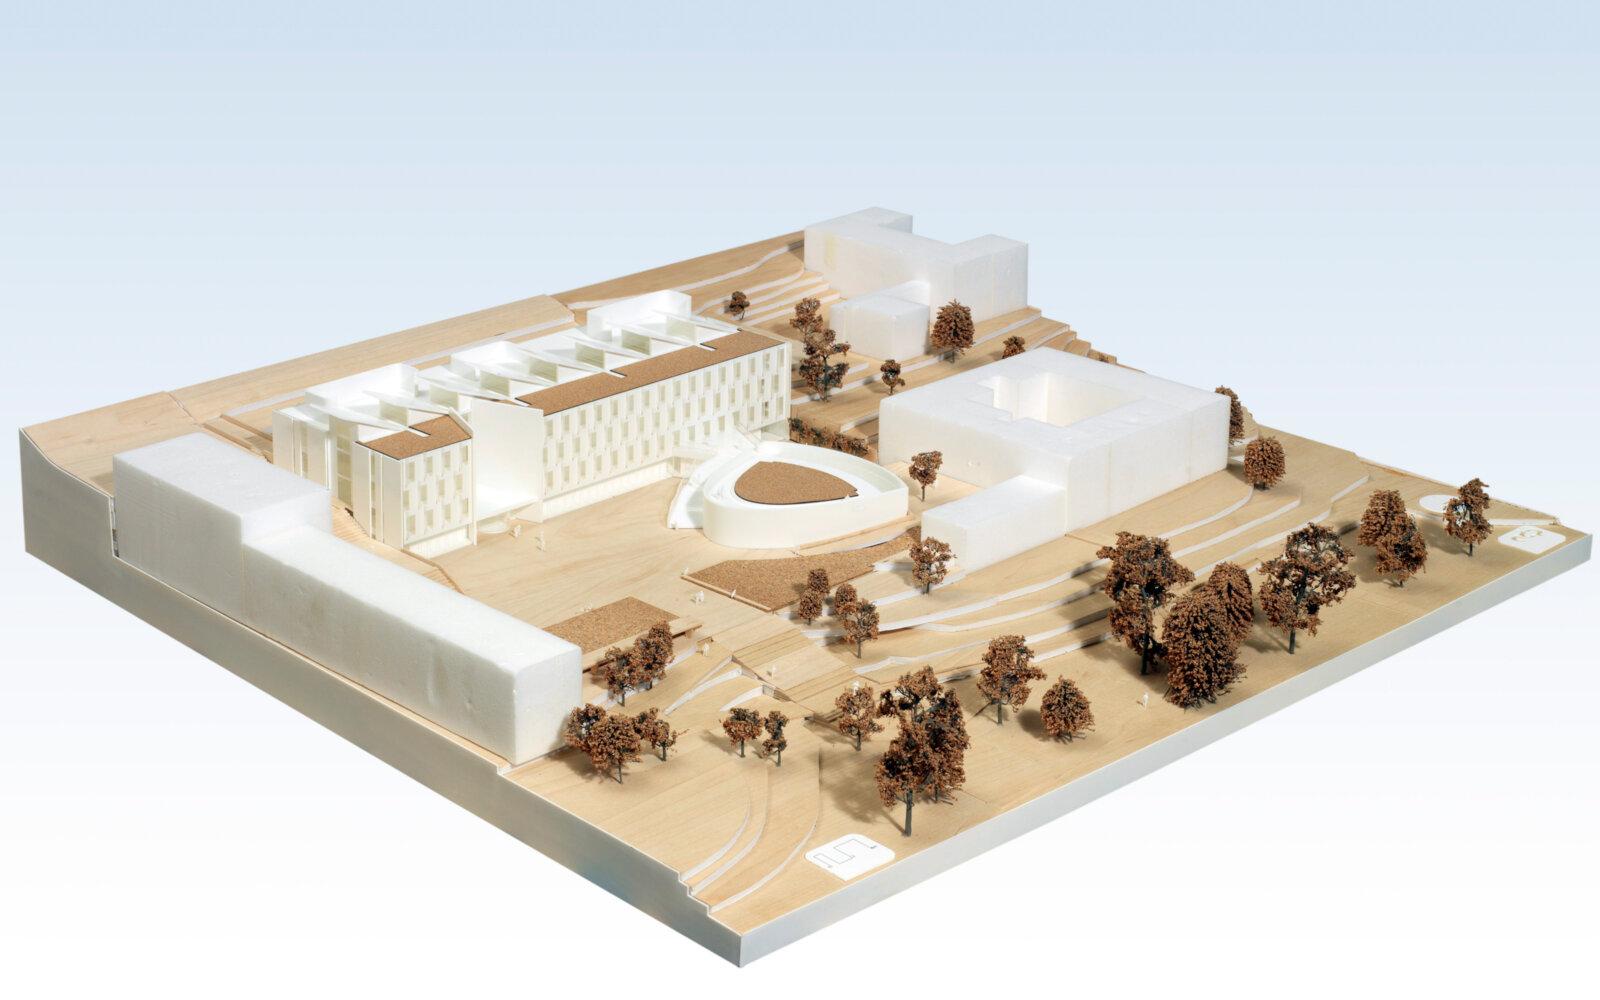 University of Sussex 3D model